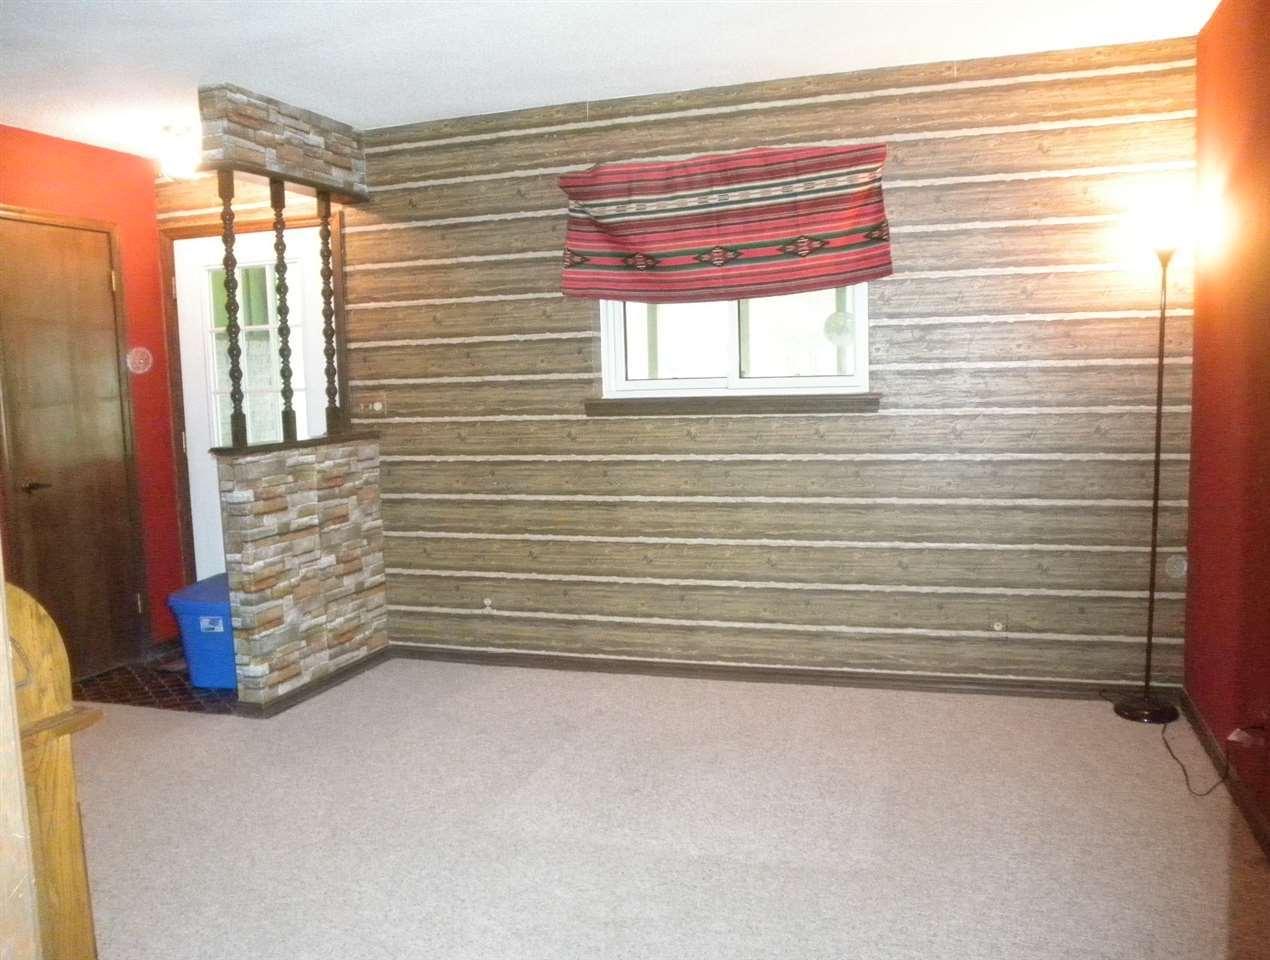 Sold Cross Sale W/ MLS | 357 30 Road  Ponca City, OK 74604 11